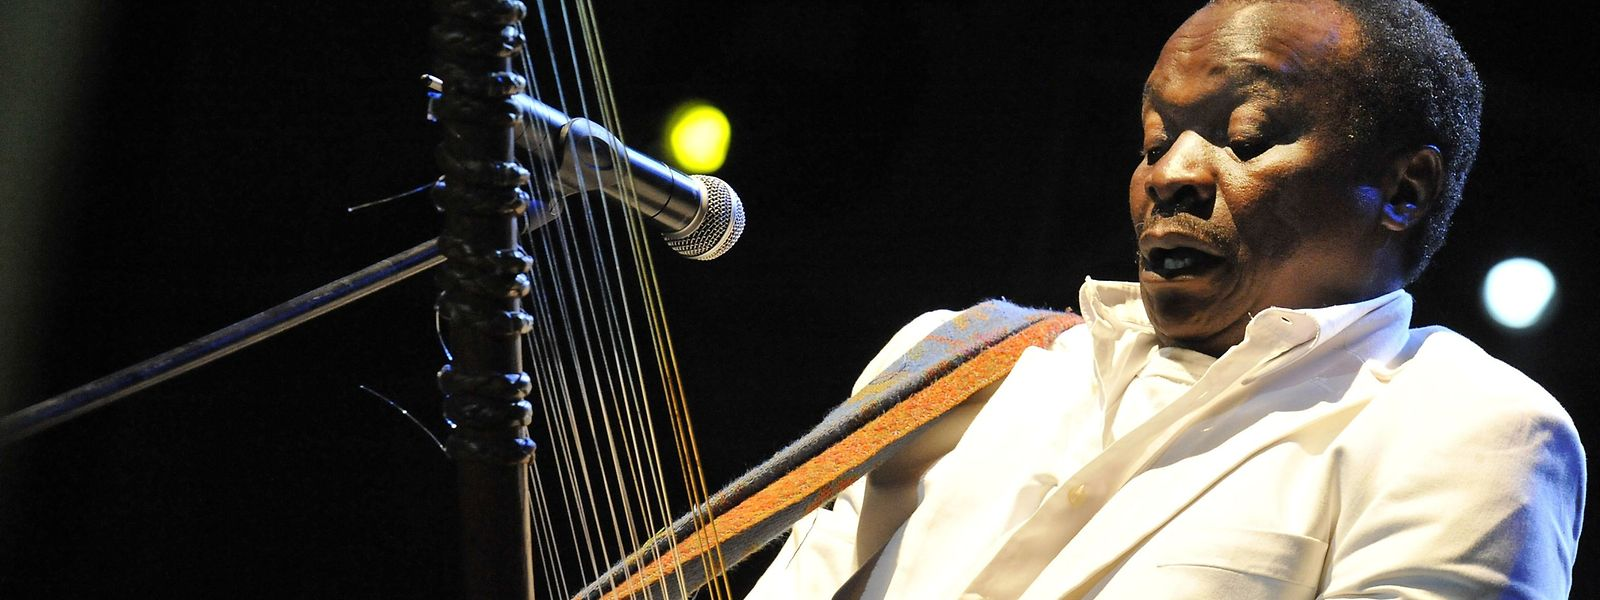 Mory Kante bei seiner 'Yéké yéké Anniversary Tour' im Jahr 2008.